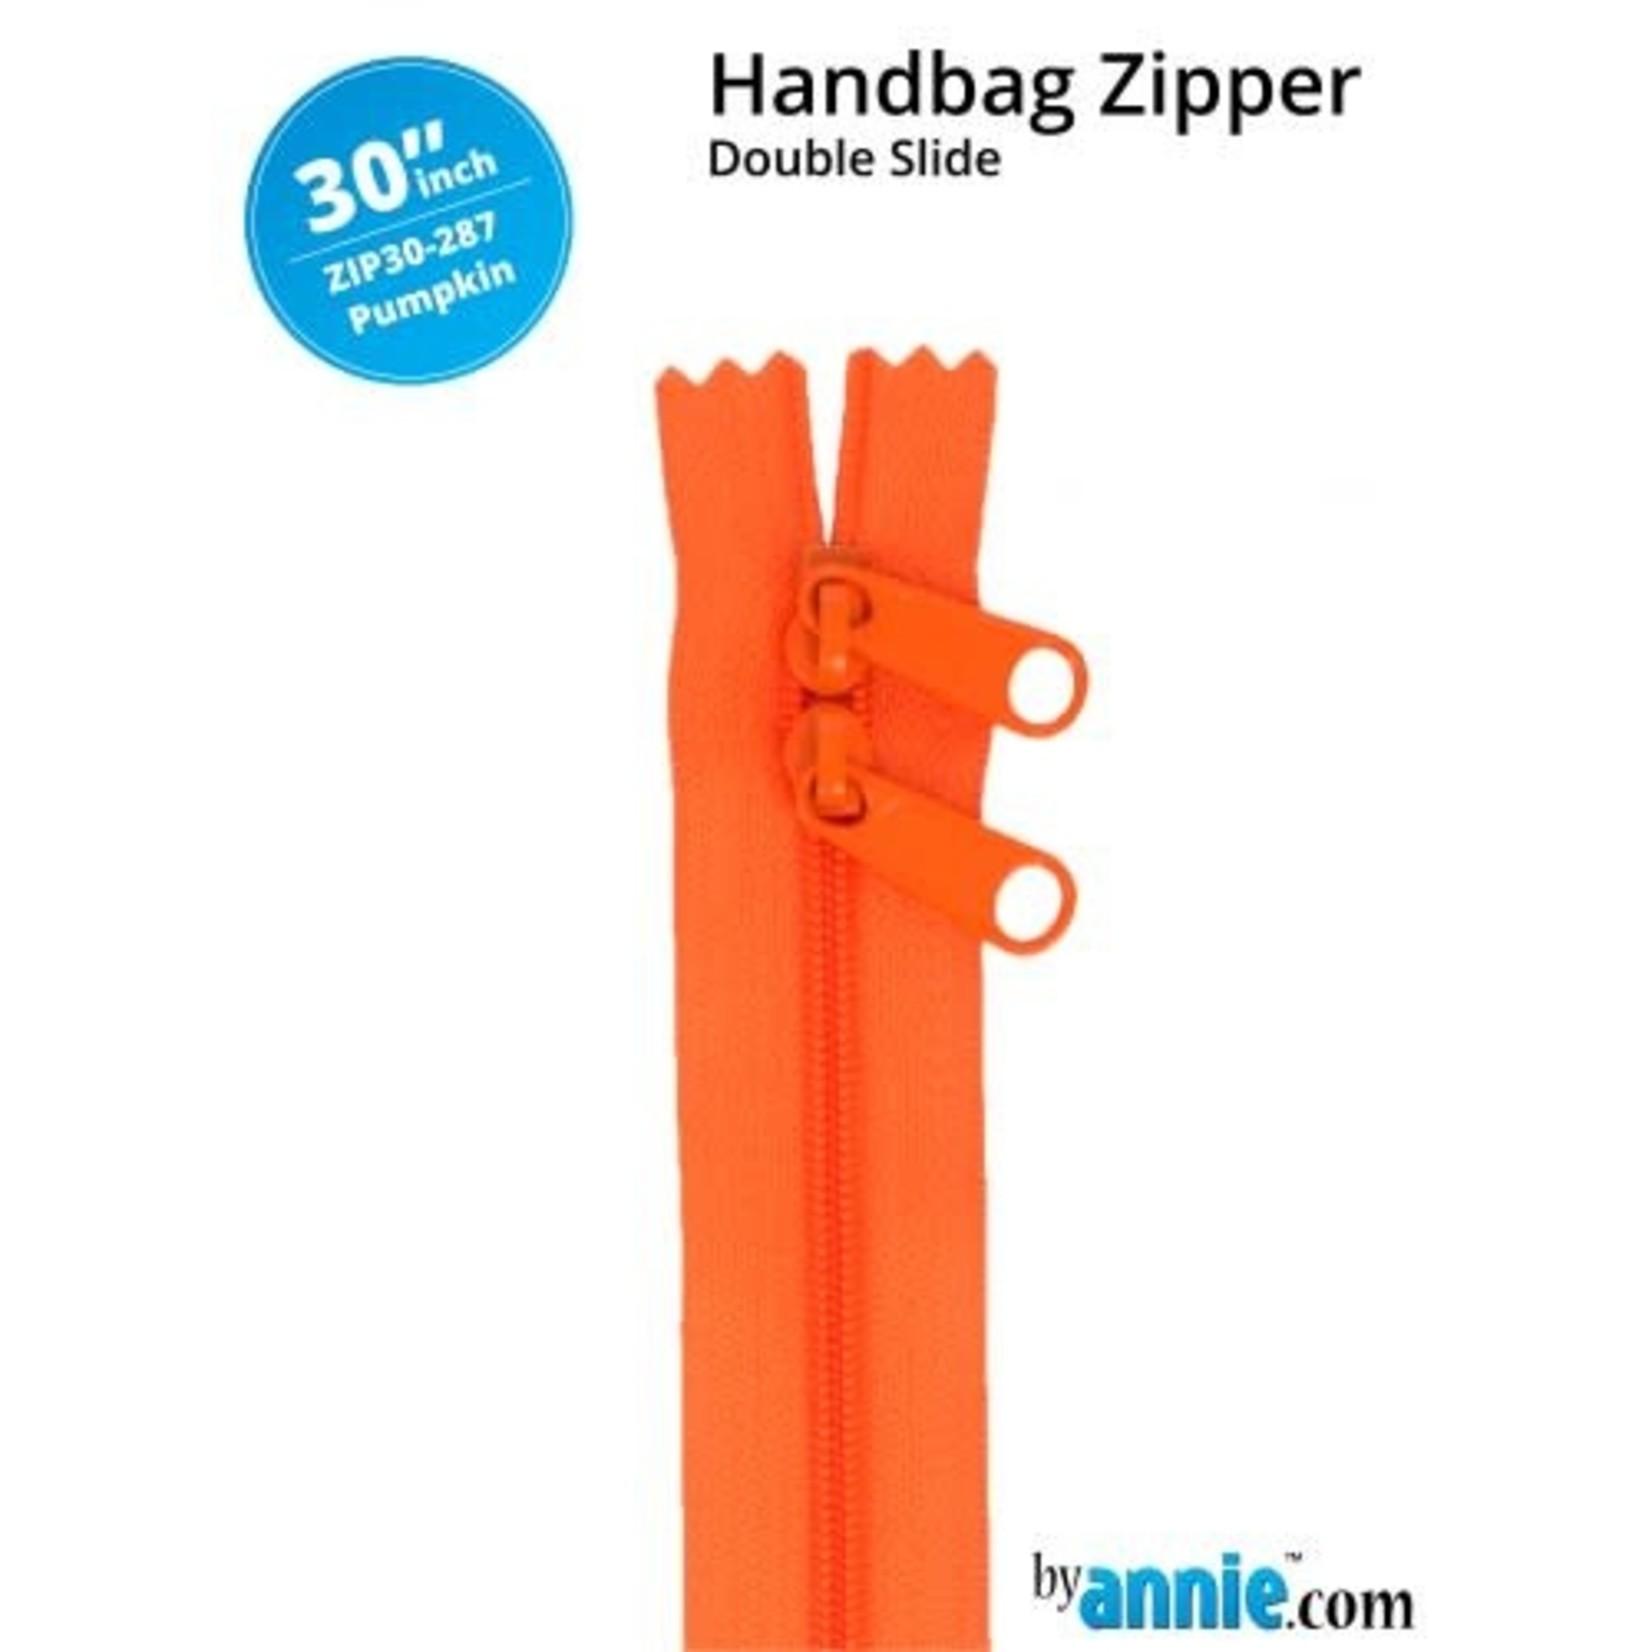 "By Annie Double Slide Handbag Zipper 30"" Rainbow 287 Pumpkin"